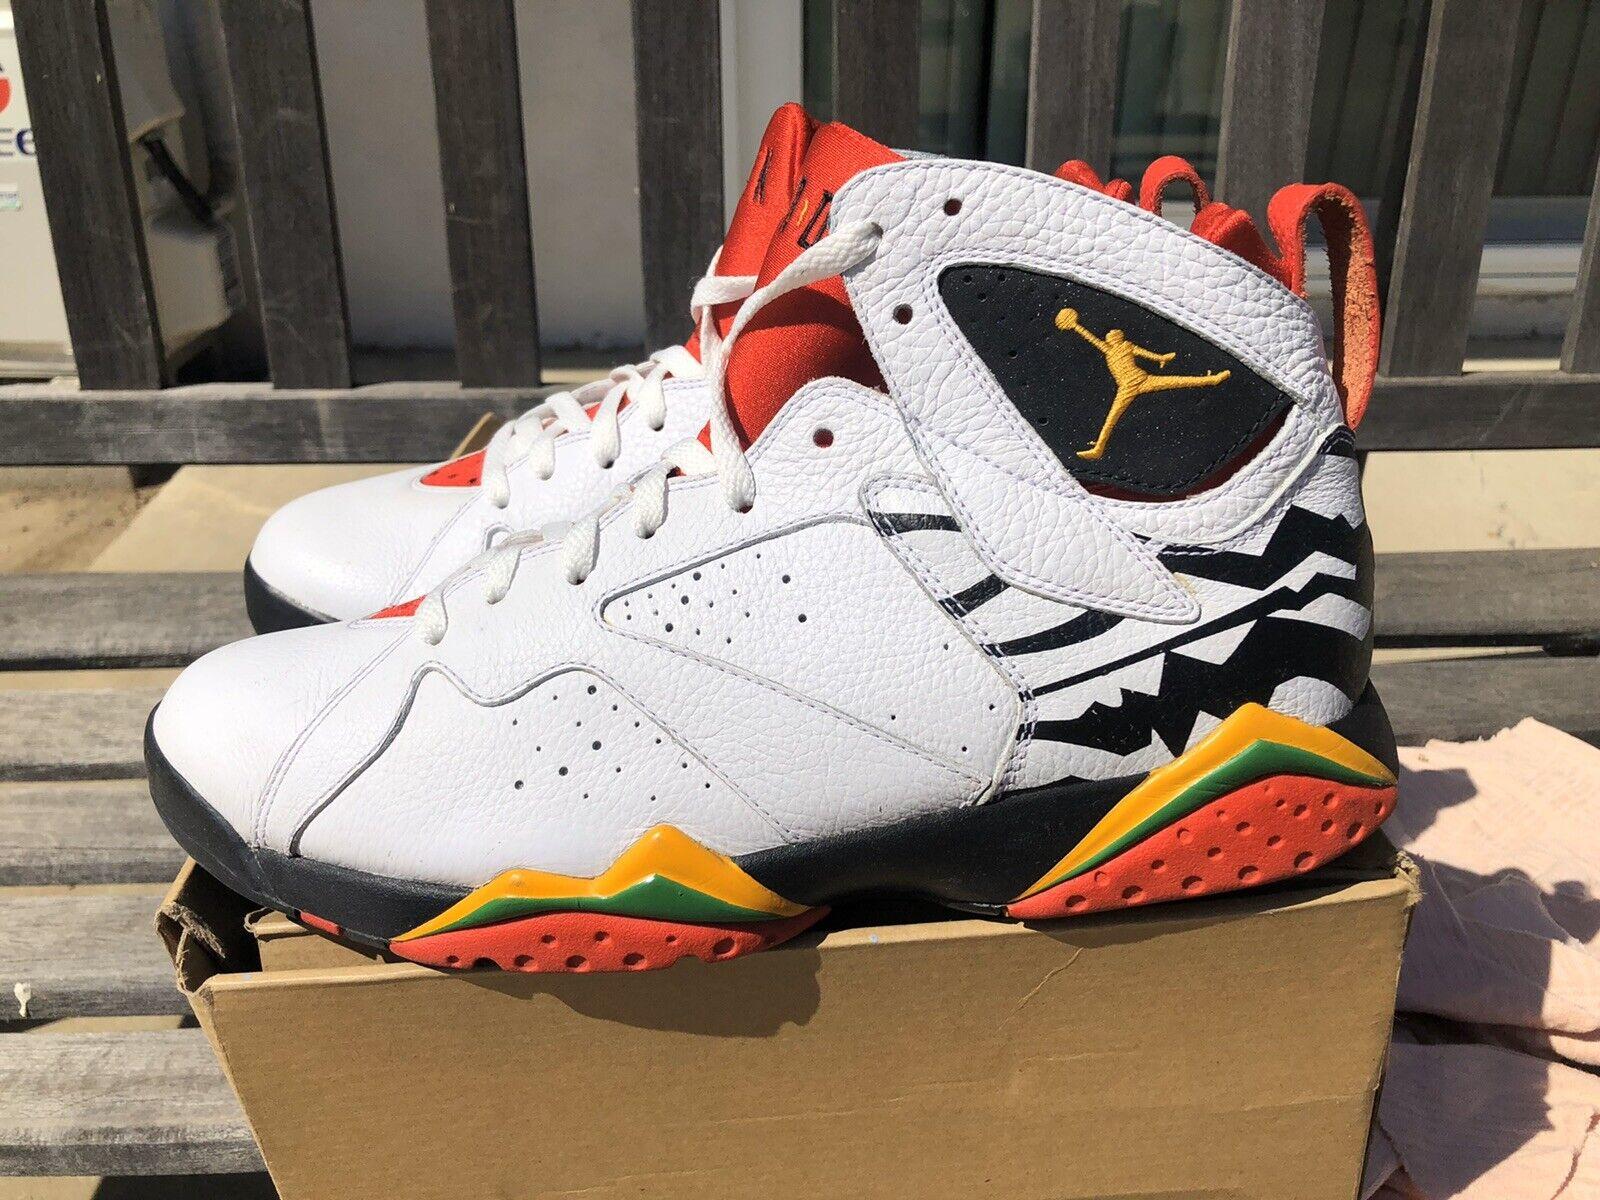 Nike Air Jordan VII 7 Retro Premio 23 Size 11 Bin 436206 101 for ...